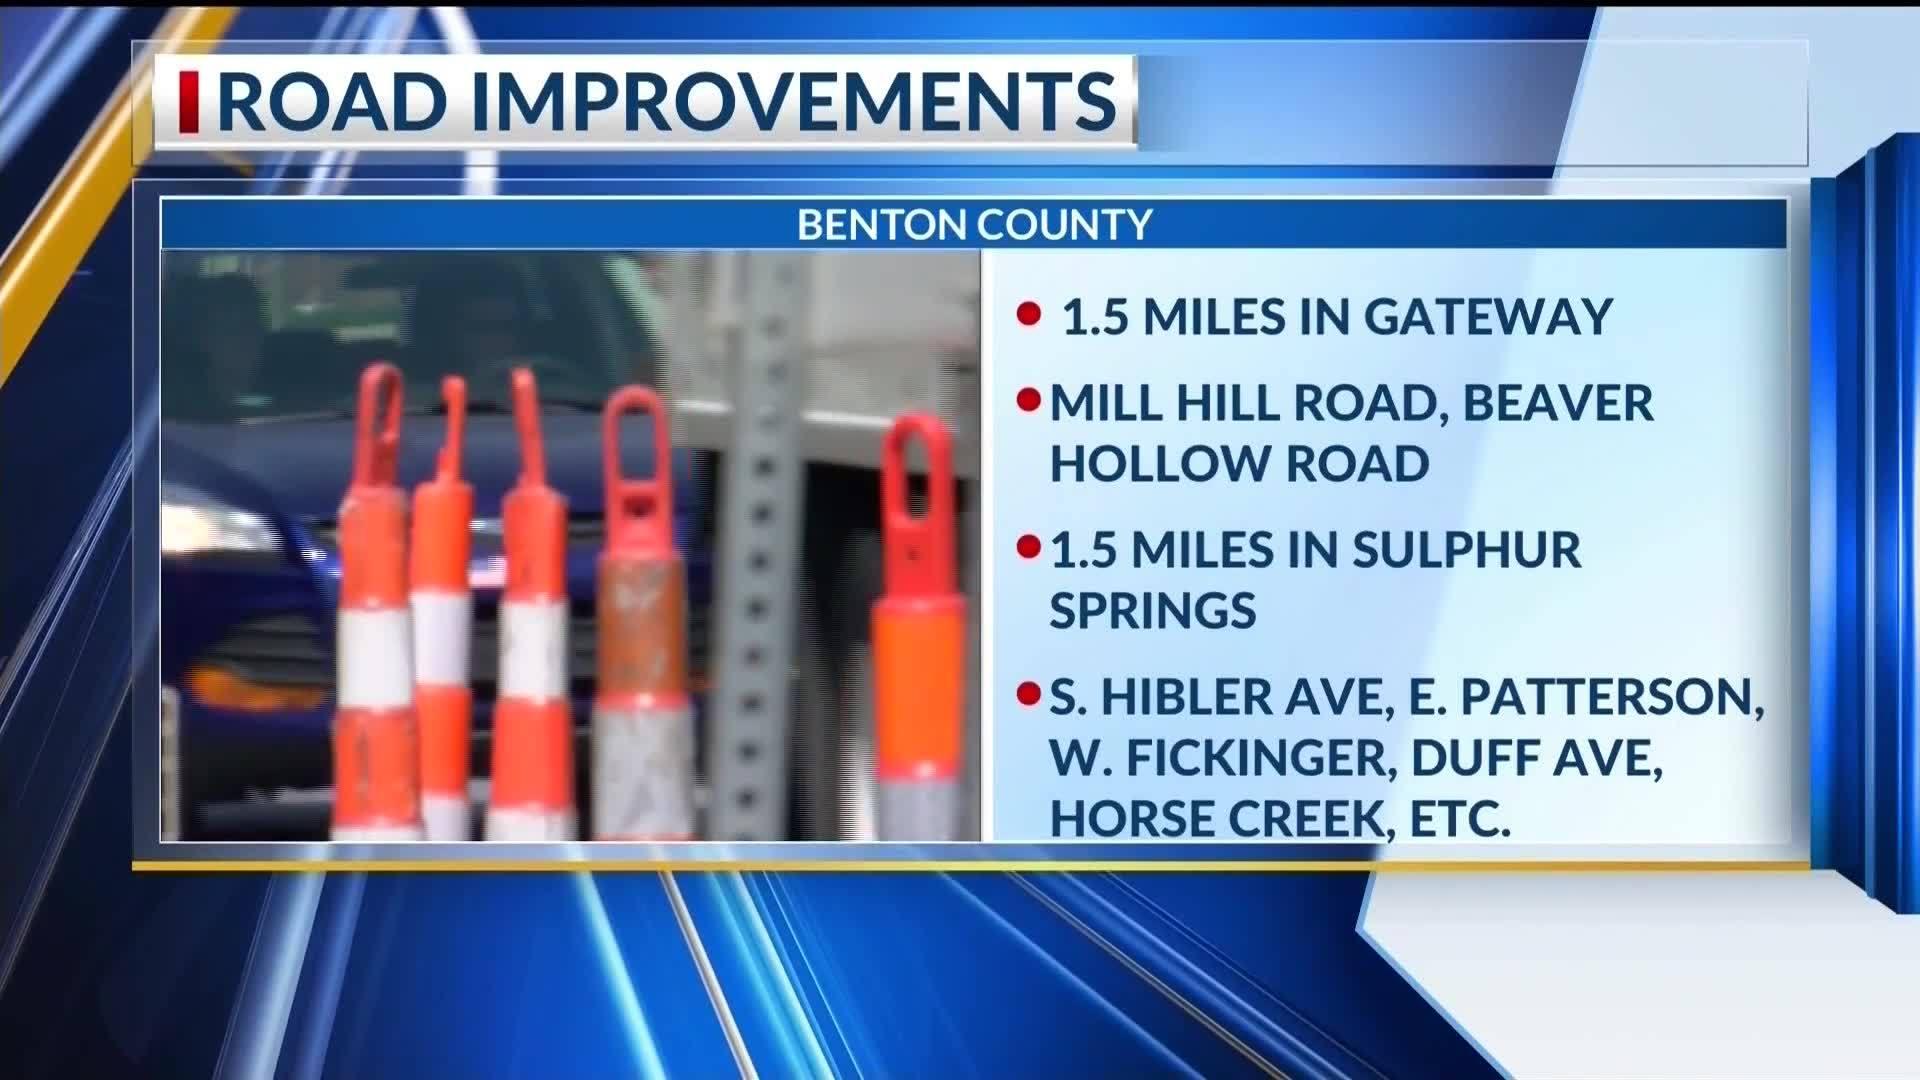 Benton_County_Roadway_Improvements_4_20190316232359